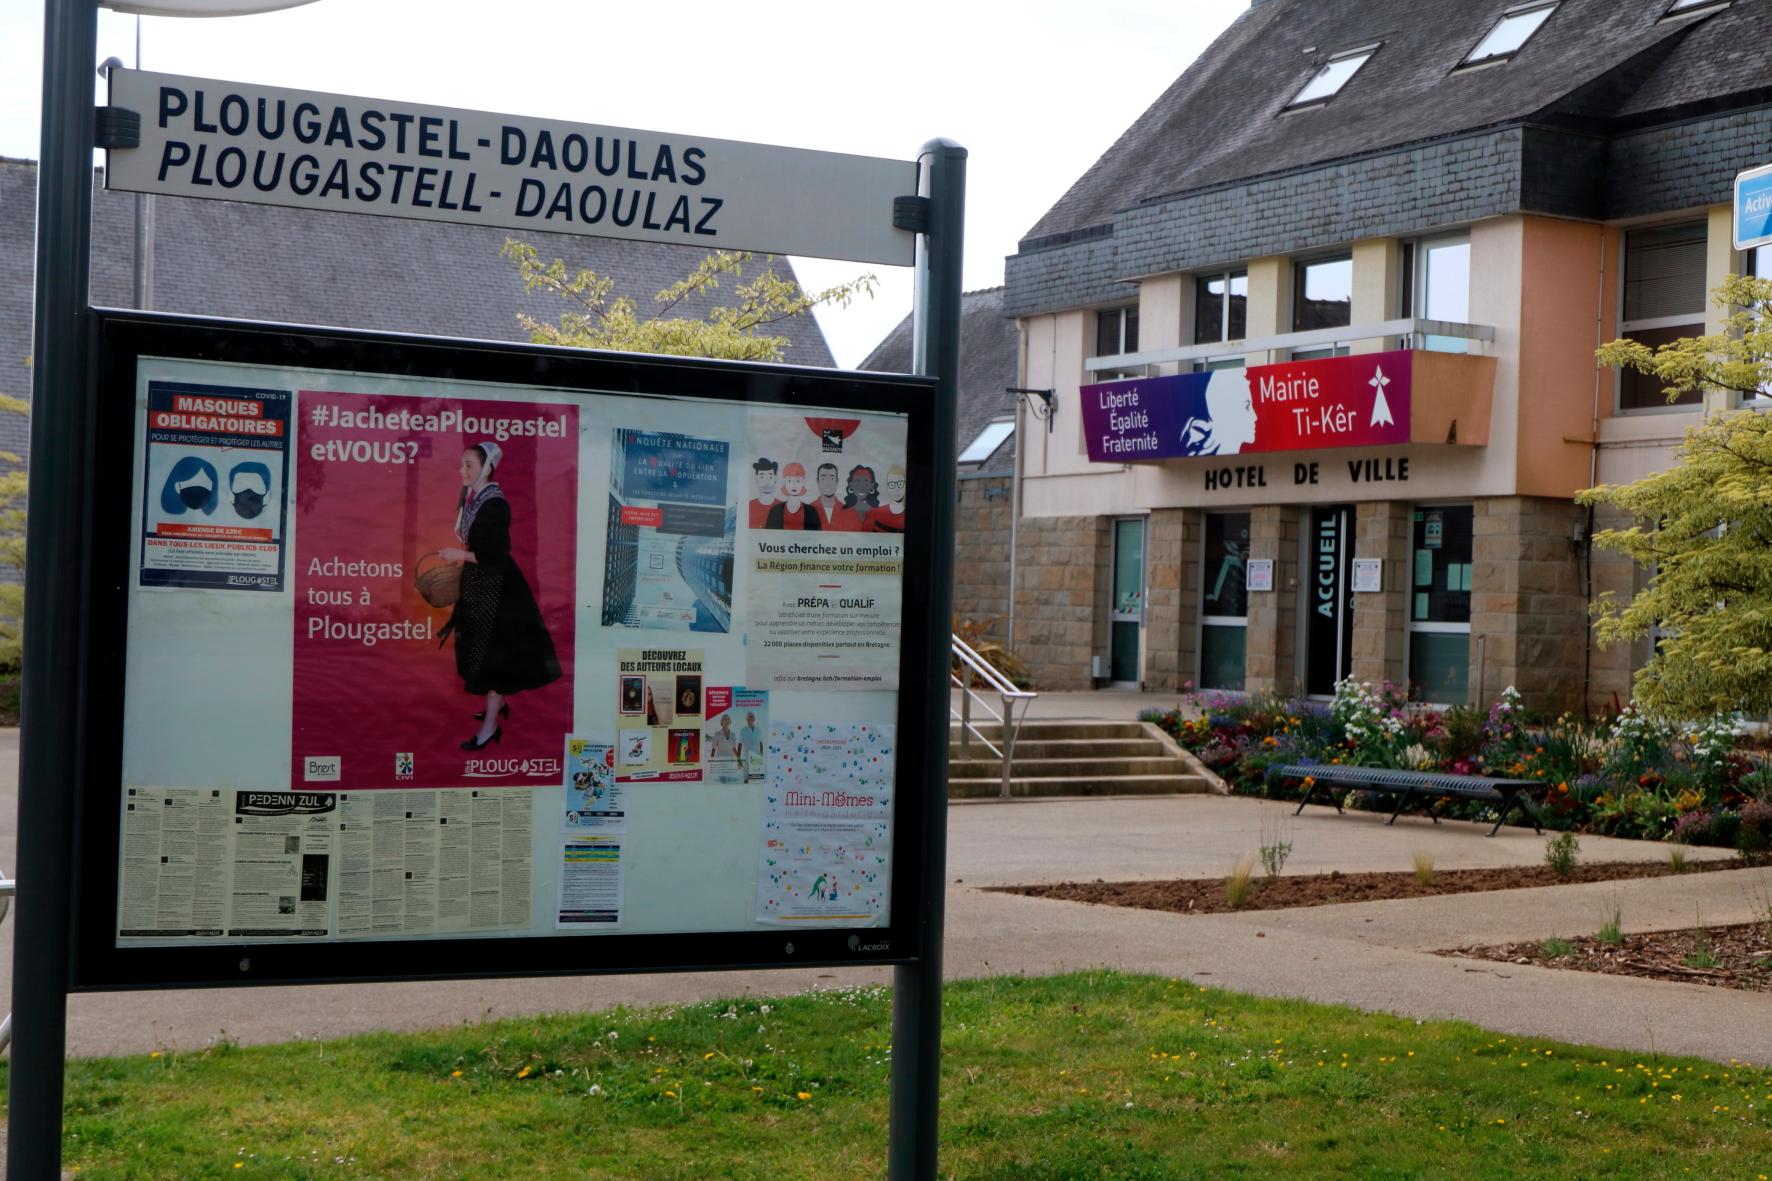 Plougastel-bourg-120